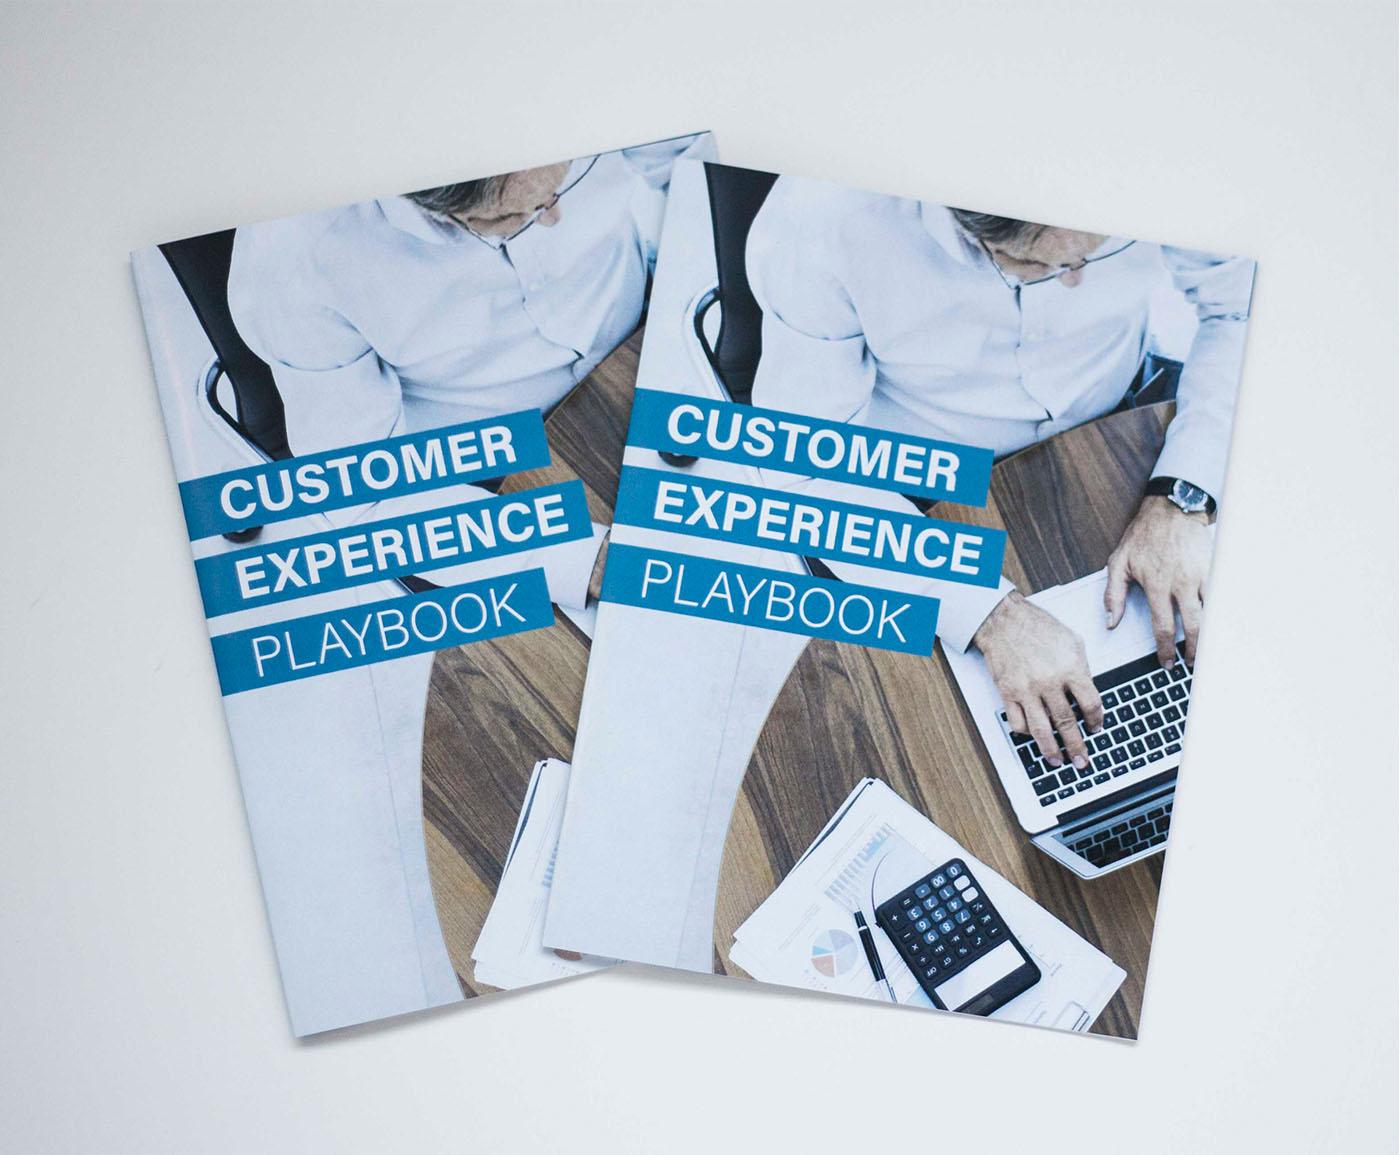 Customer Experience Playbook